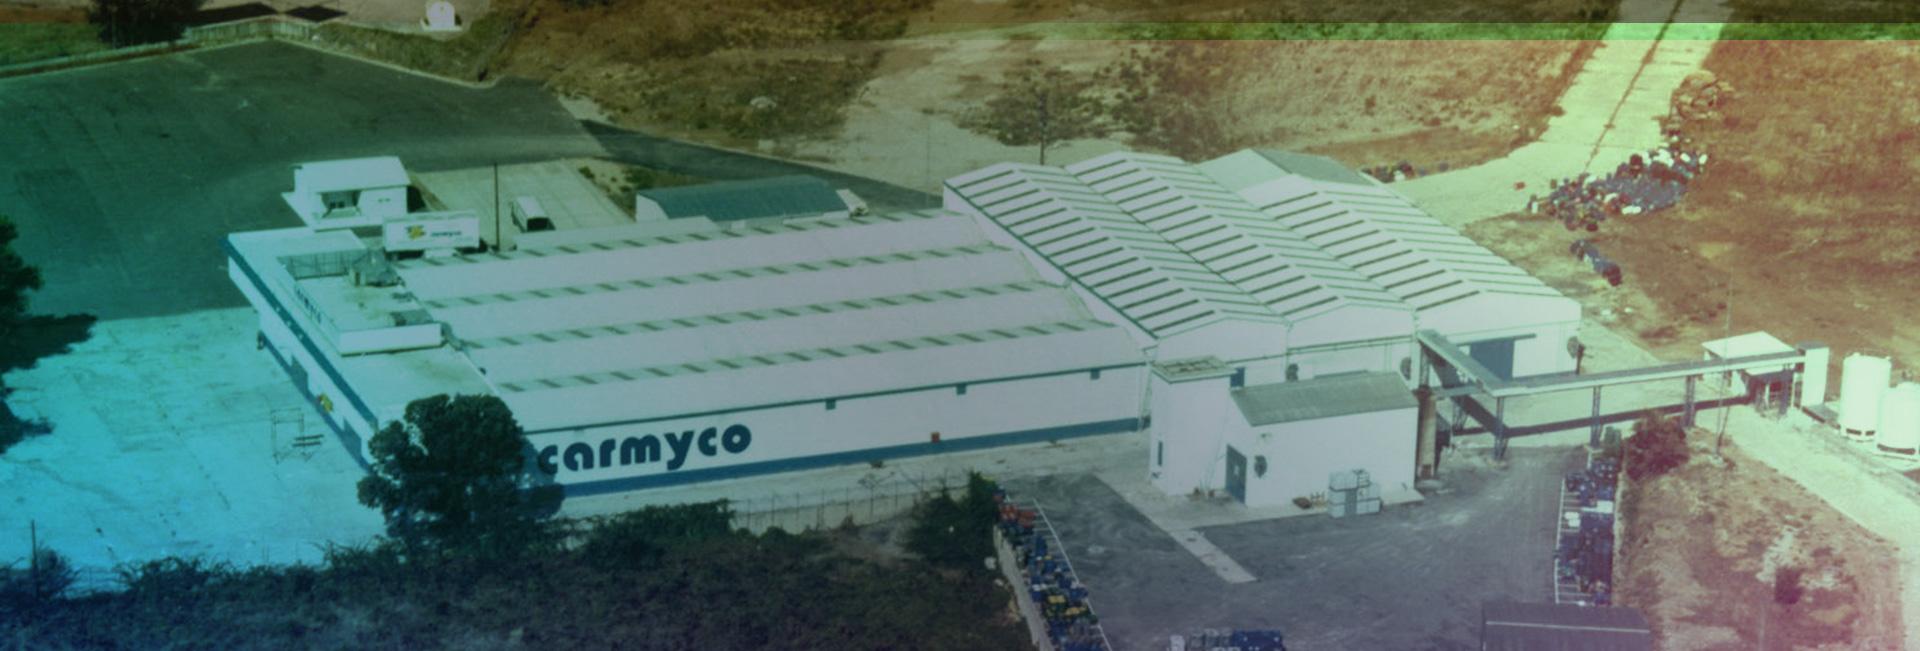 carmyco-factory